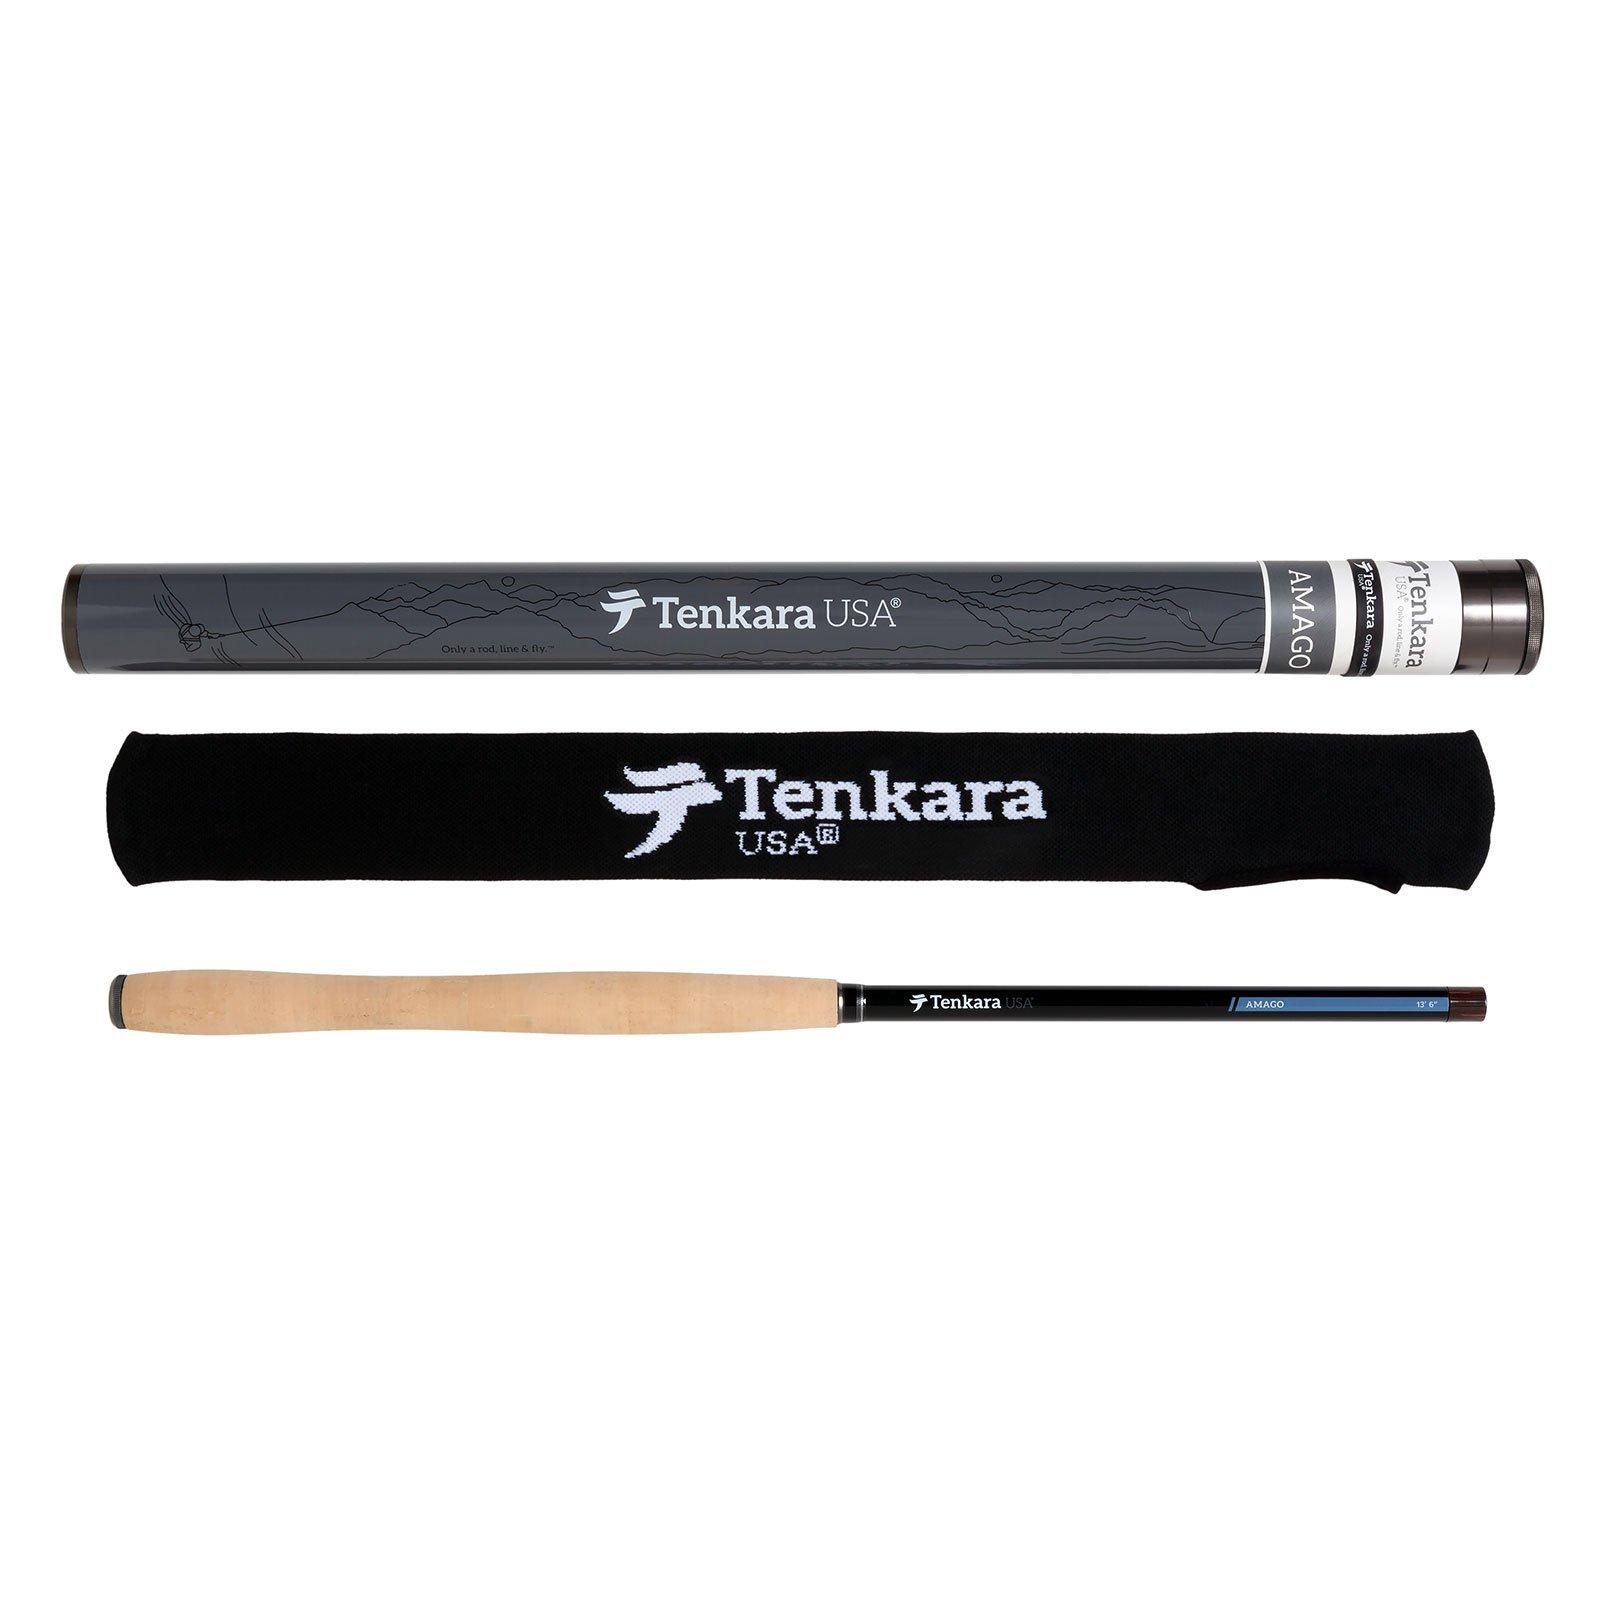 Tenkara USA Amago Fly Rod 13.5 ft. (410cm) Matte Black Telescopic Rod